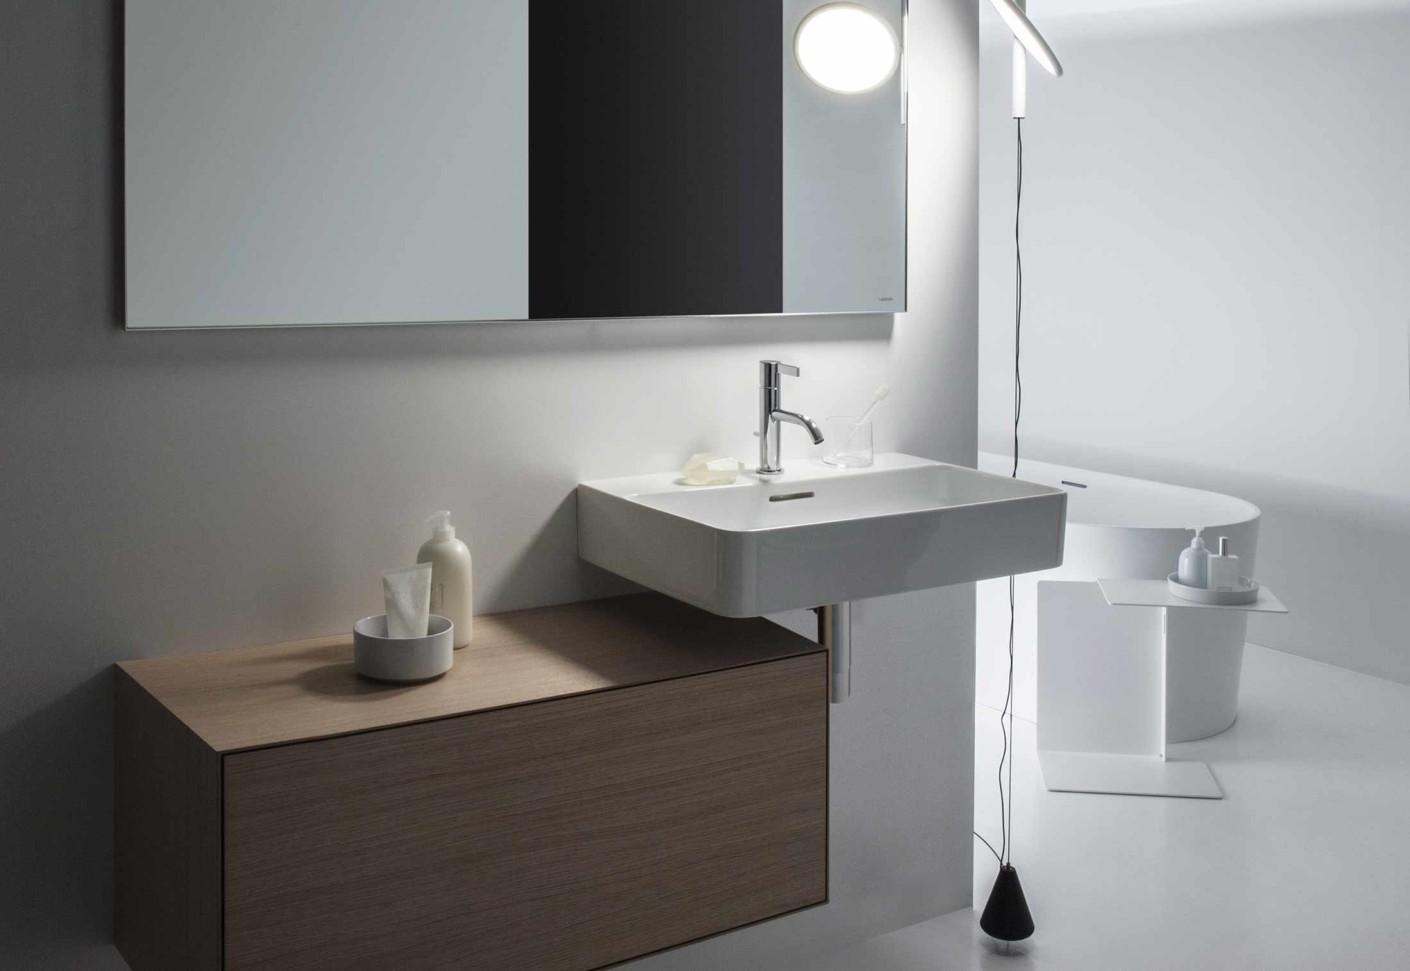 saphirkeramik val tray by laufen stylepark. Black Bedroom Furniture Sets. Home Design Ideas